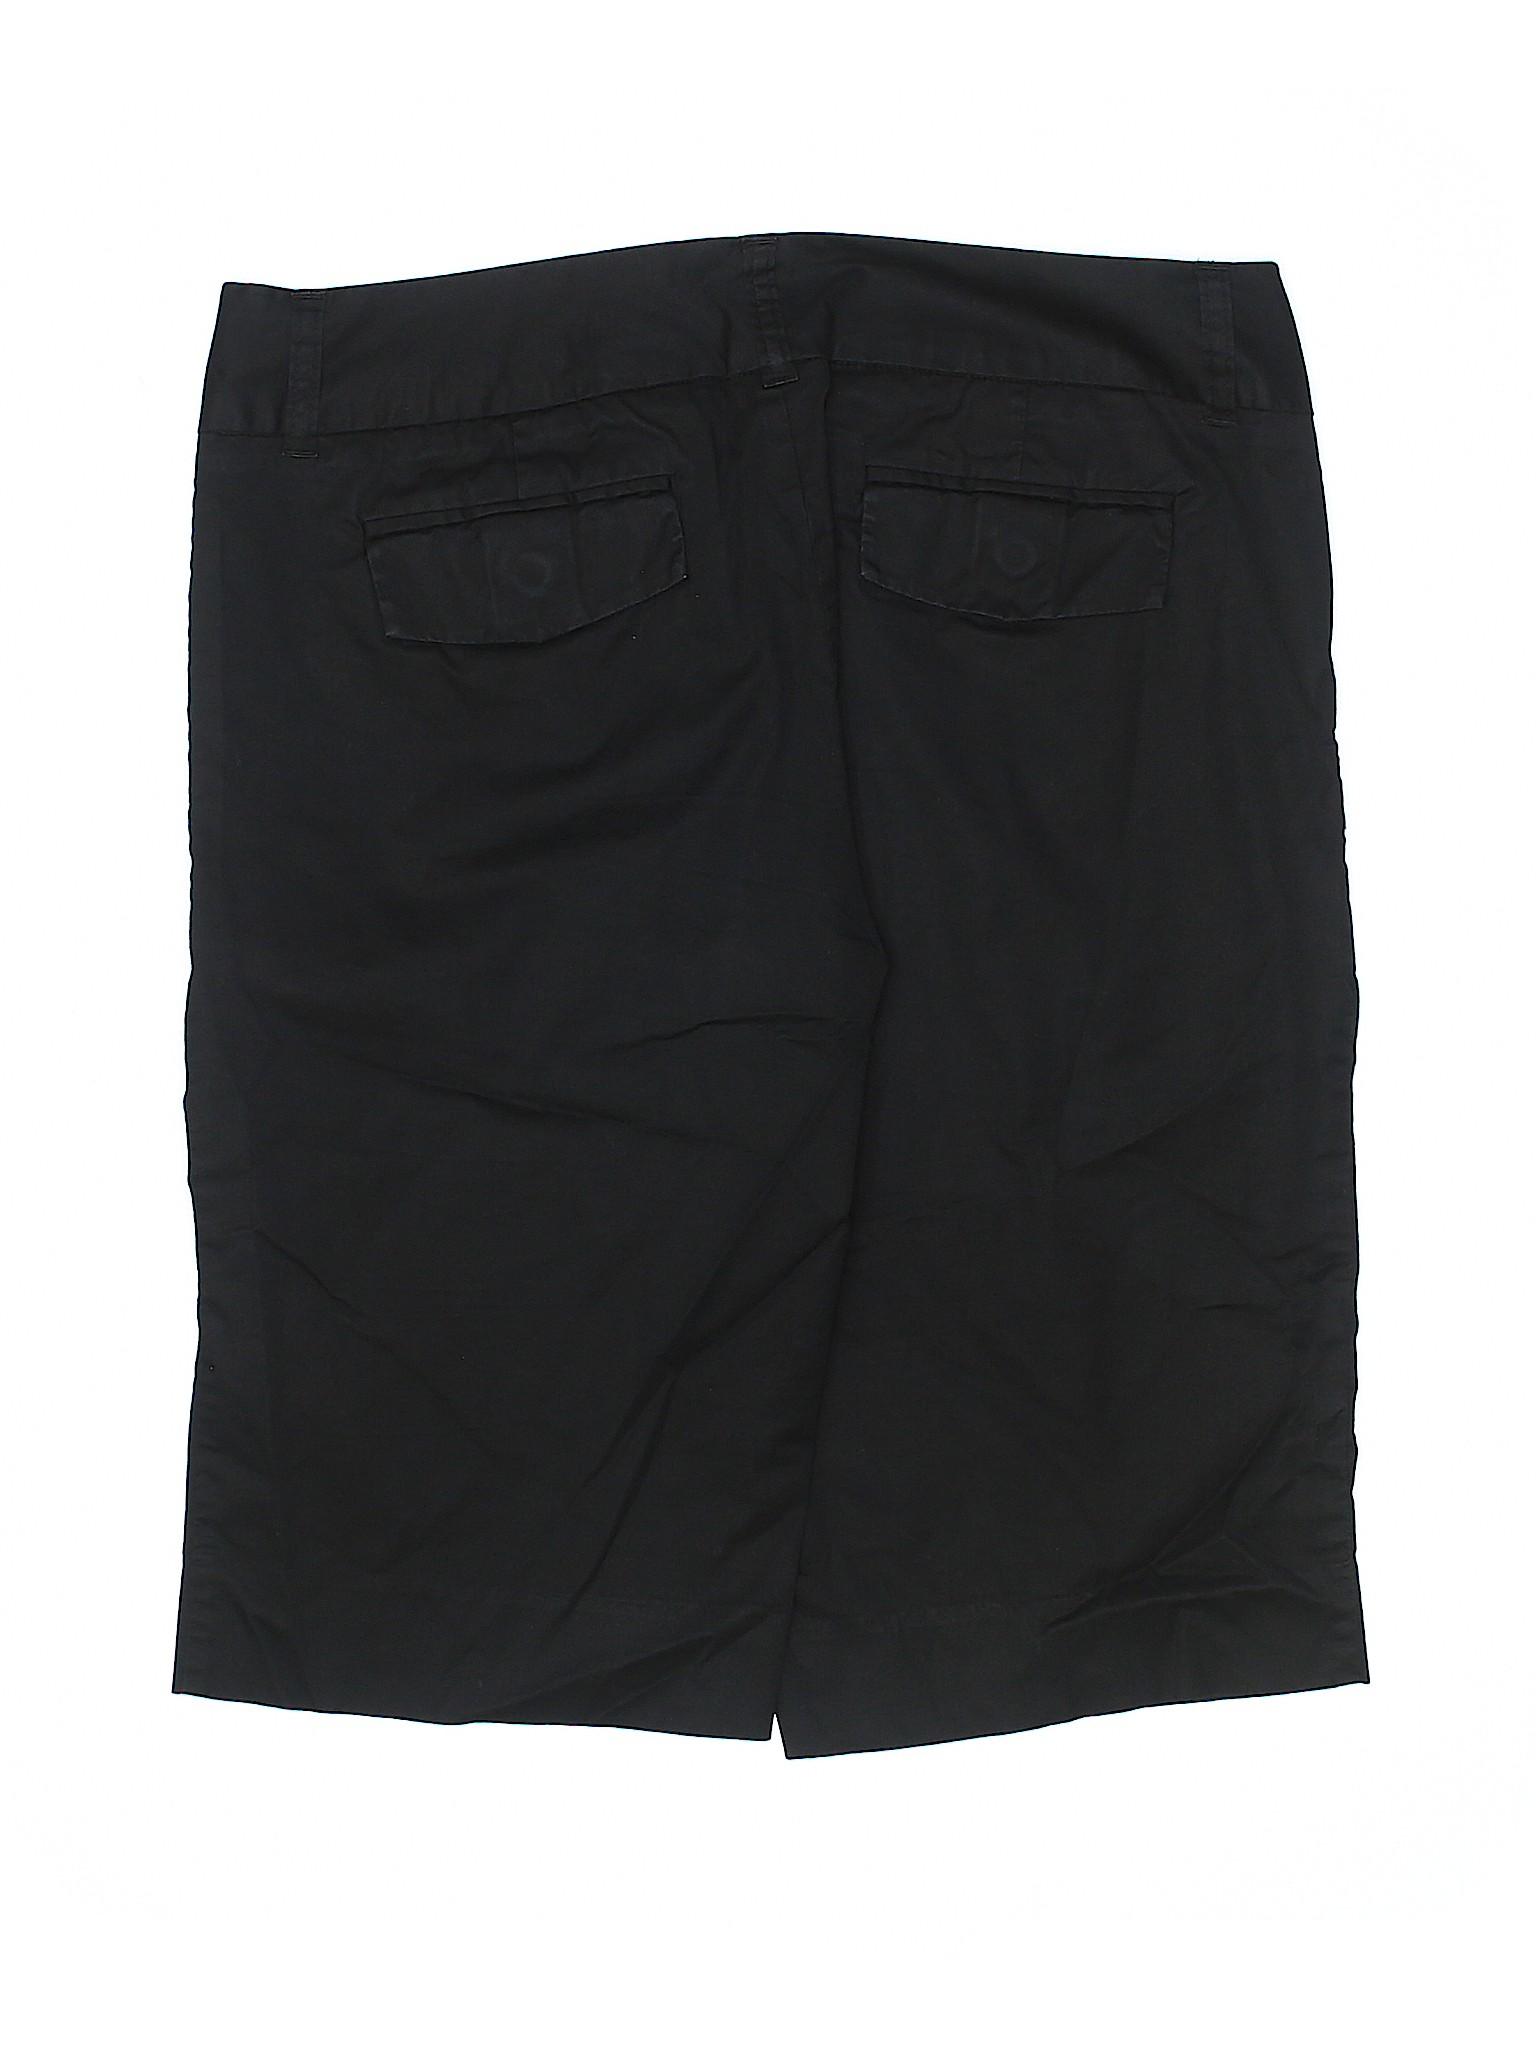 Shorts Gap Leisure Leisure winter winter Khaki wqw0FYf